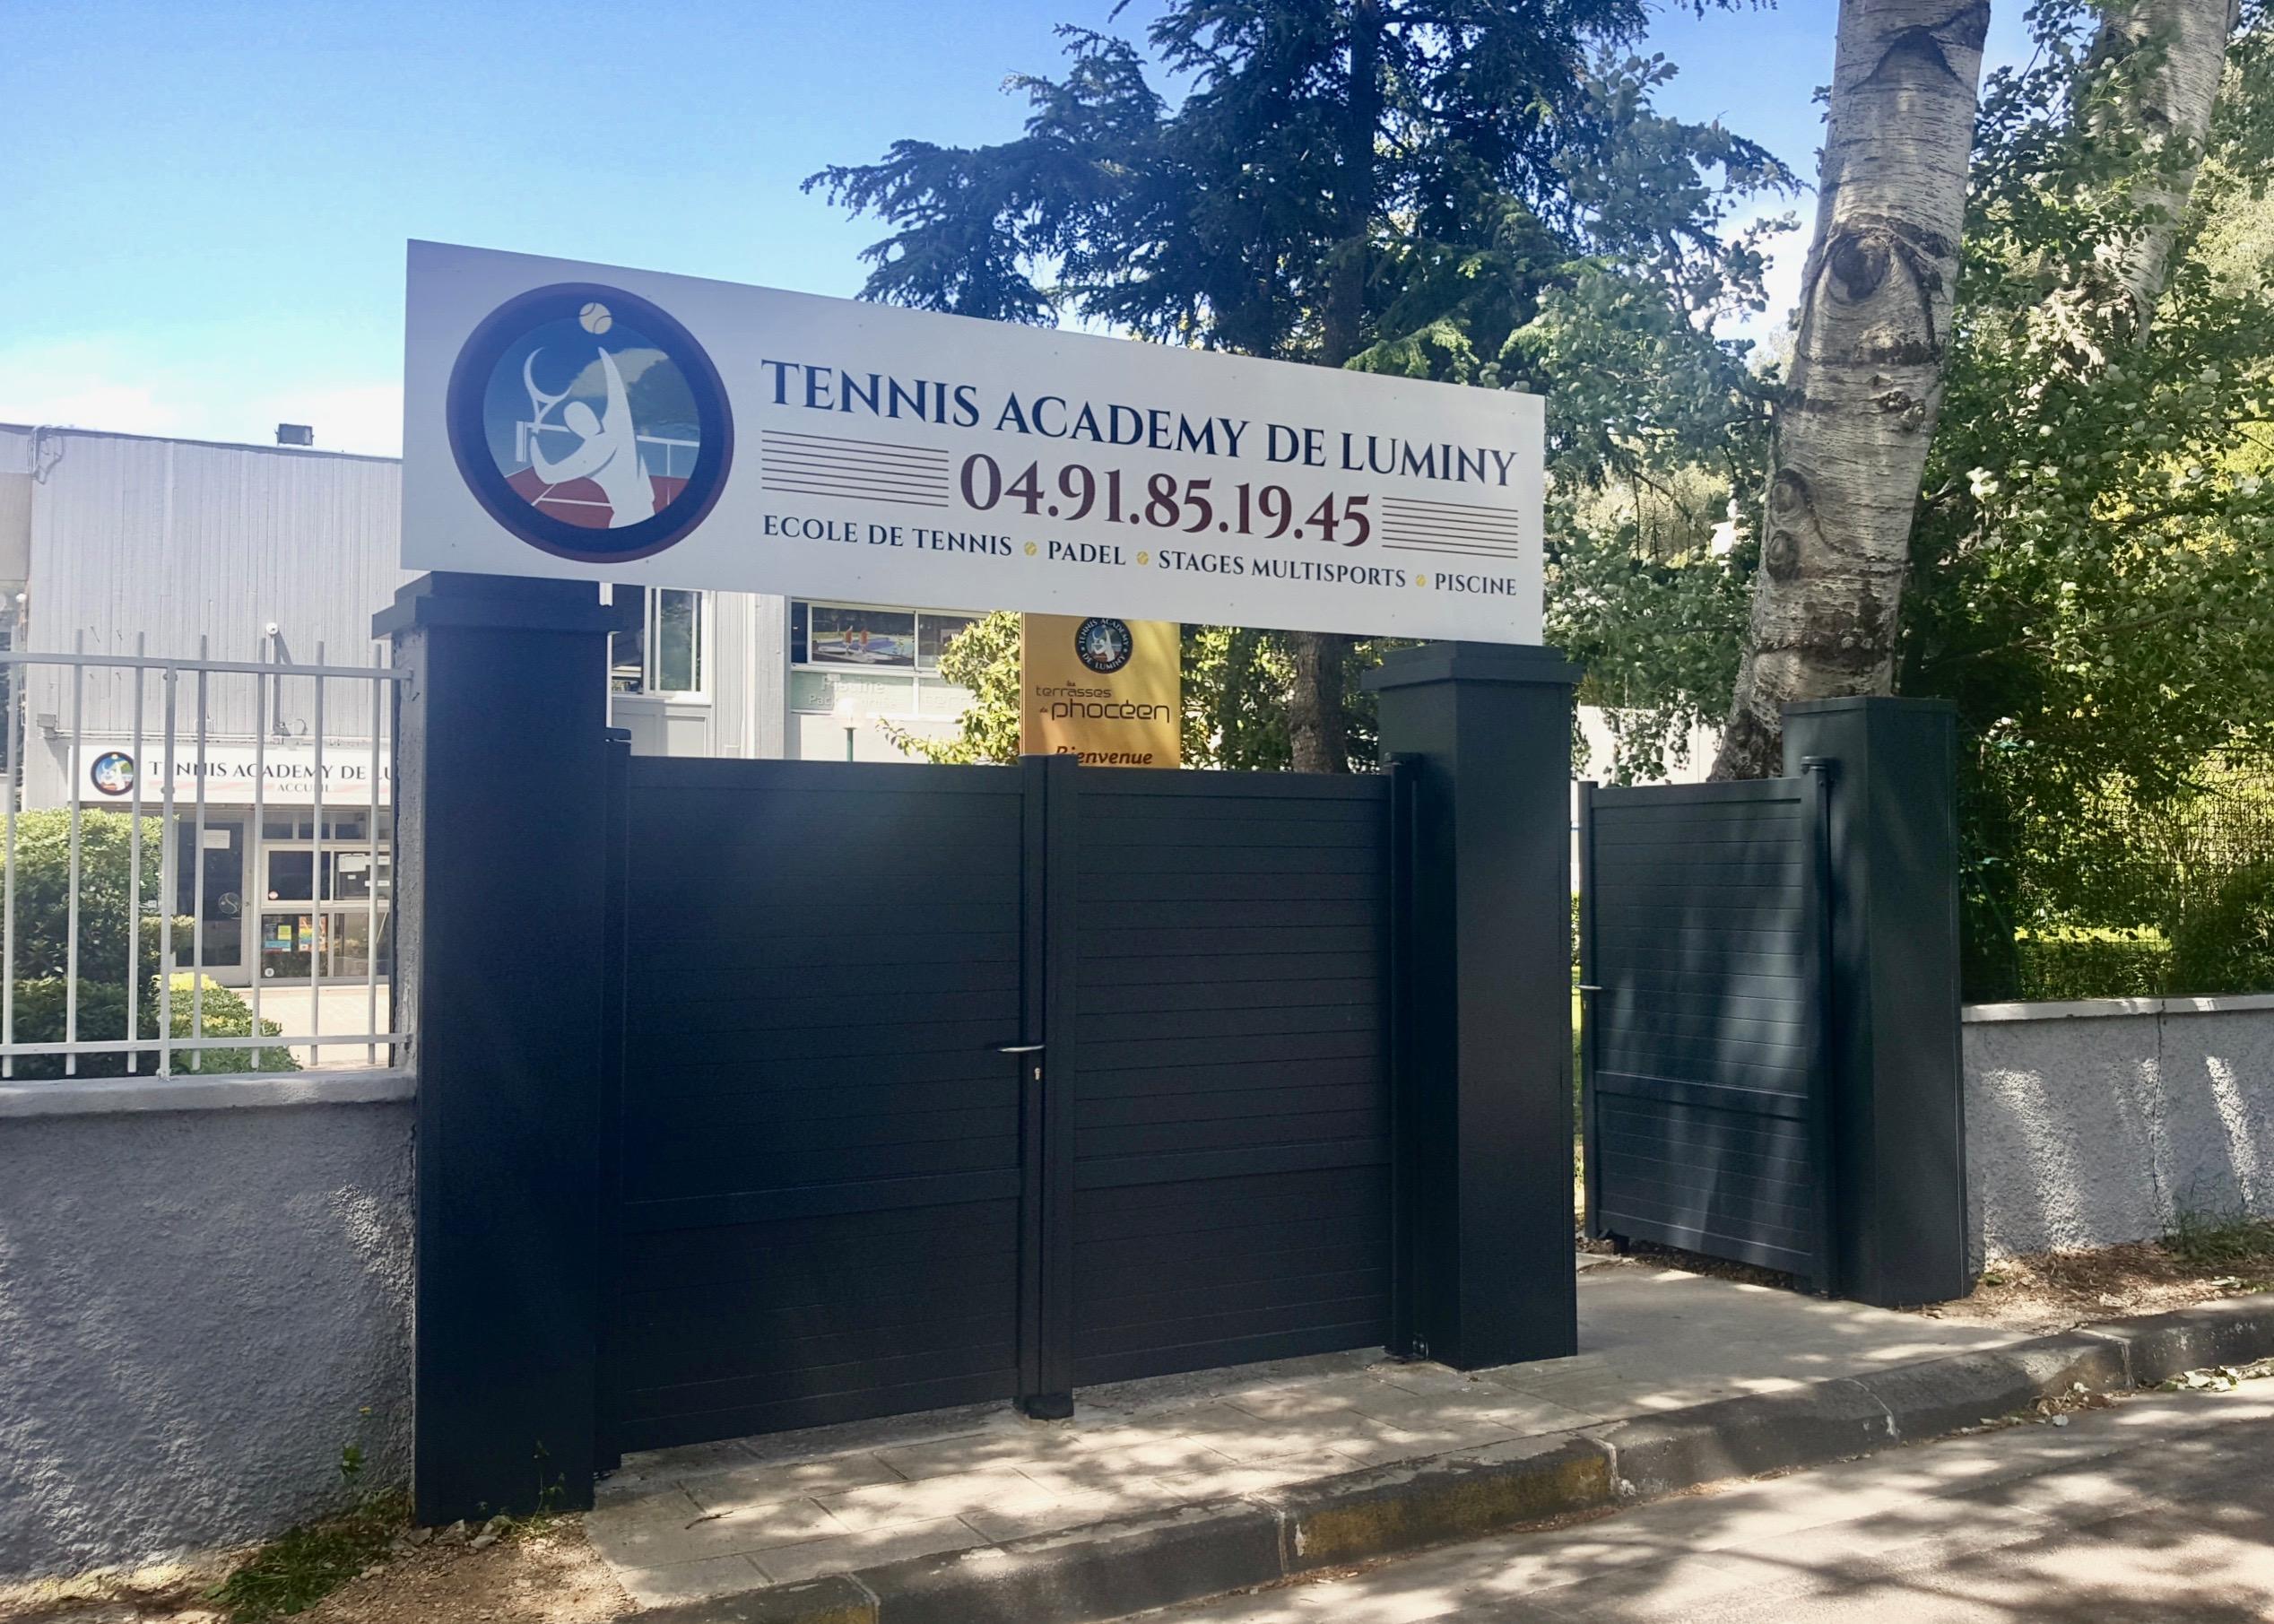 tennis club marseille - tennis academy luminy - love spots - Ecole De Cuisine Marseille